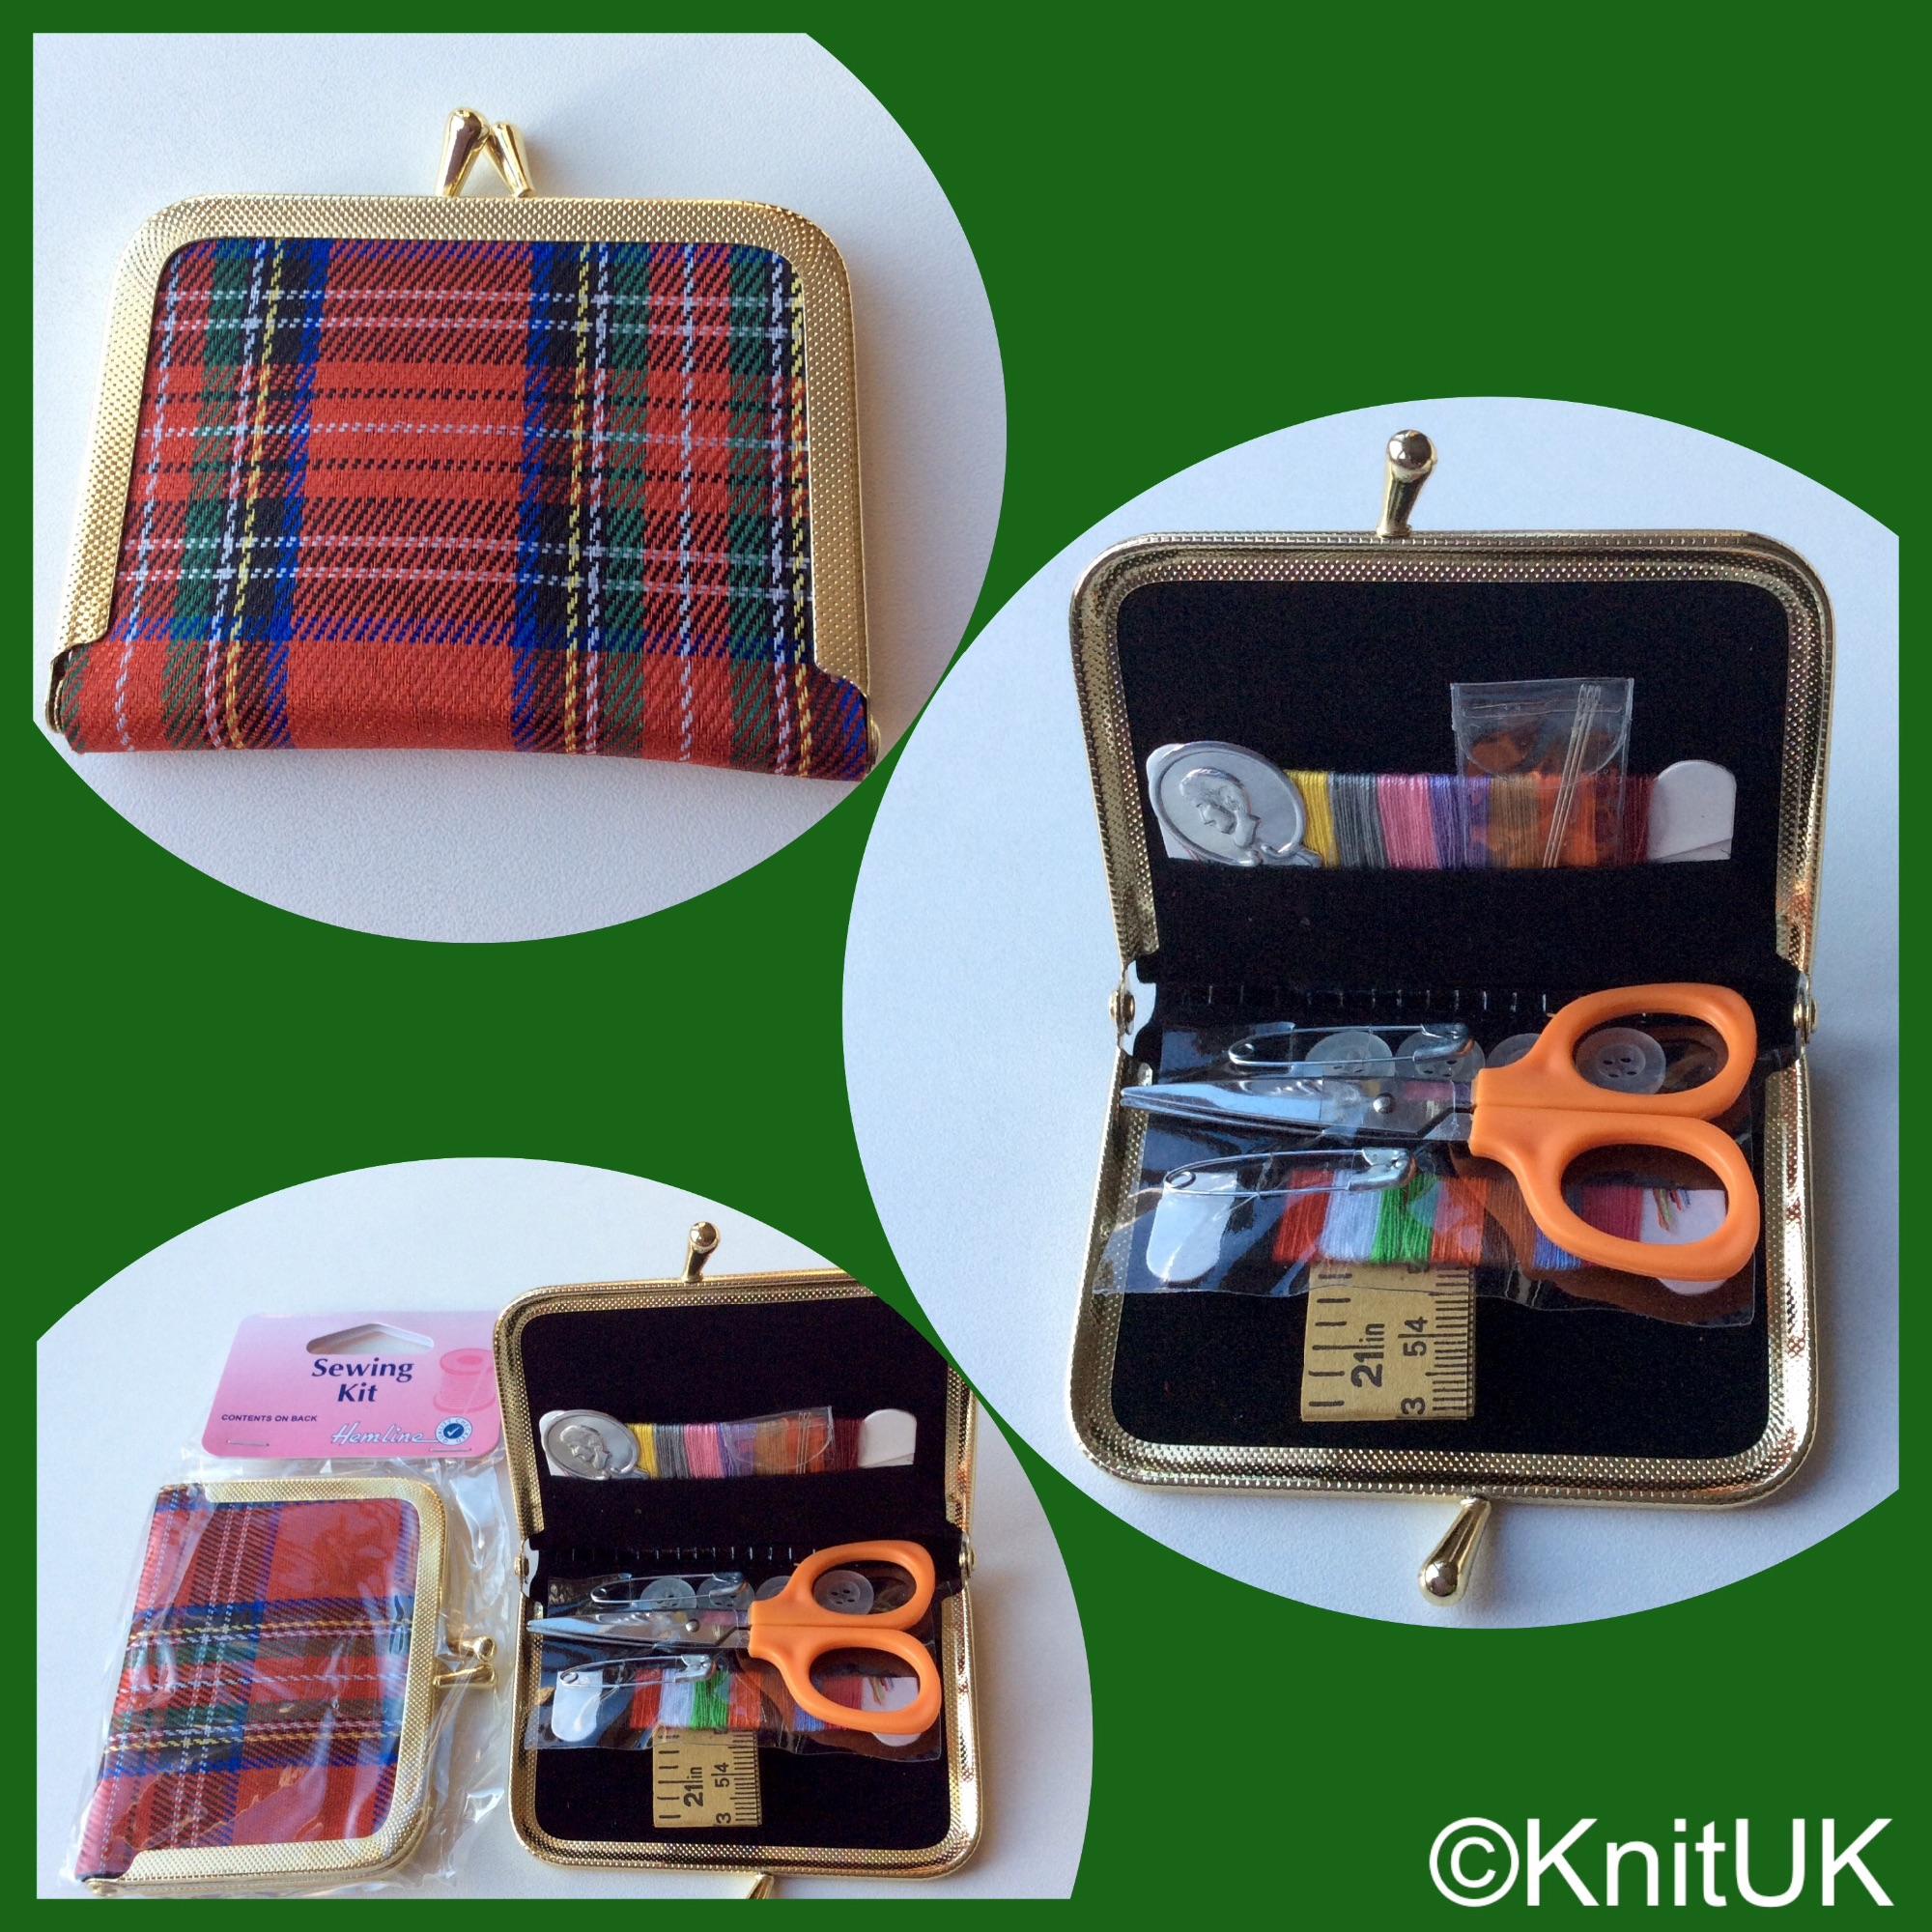 Hemline purse sewing kit 3pics